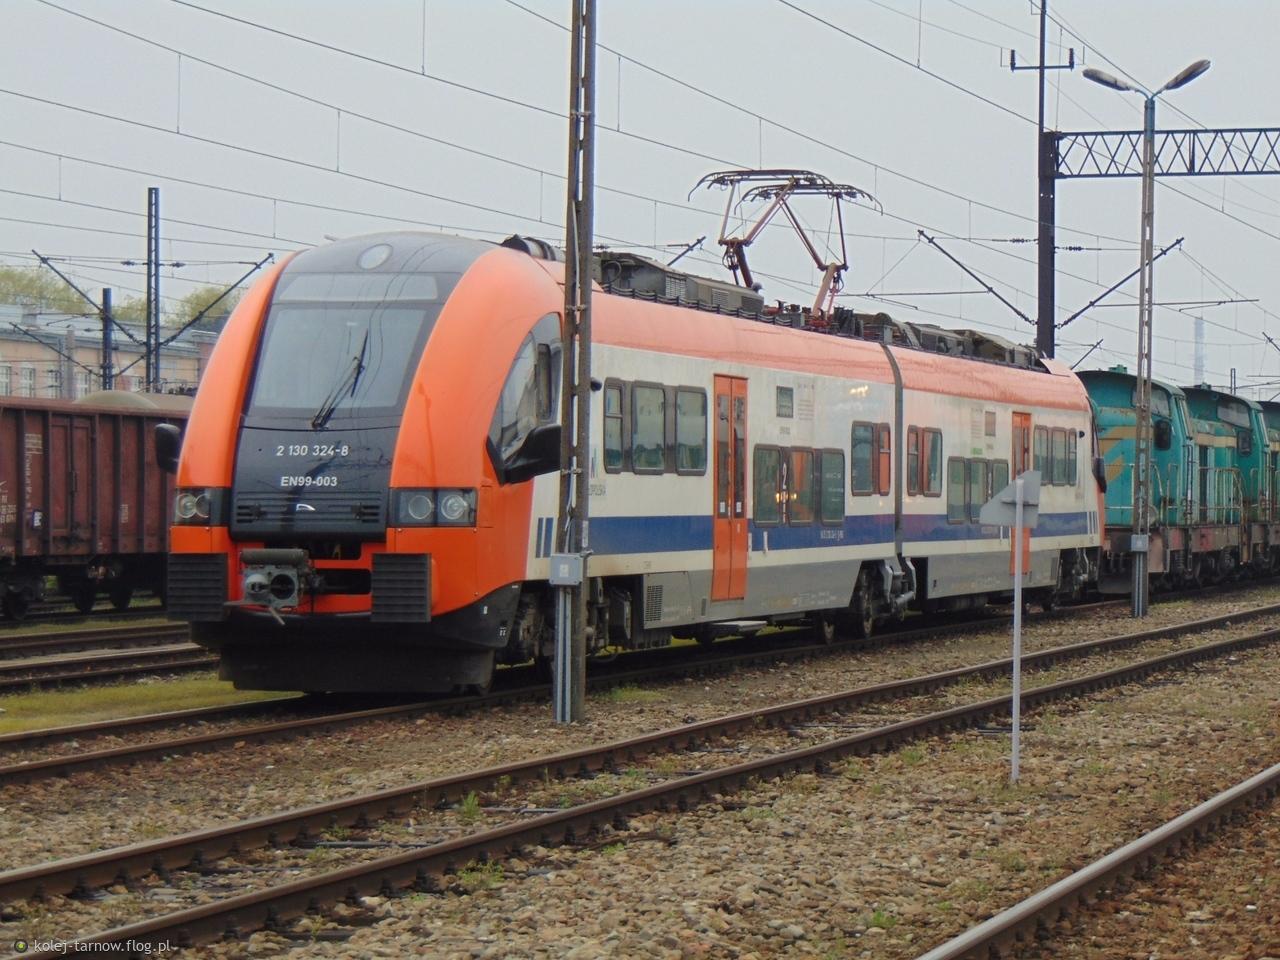 EN99-003